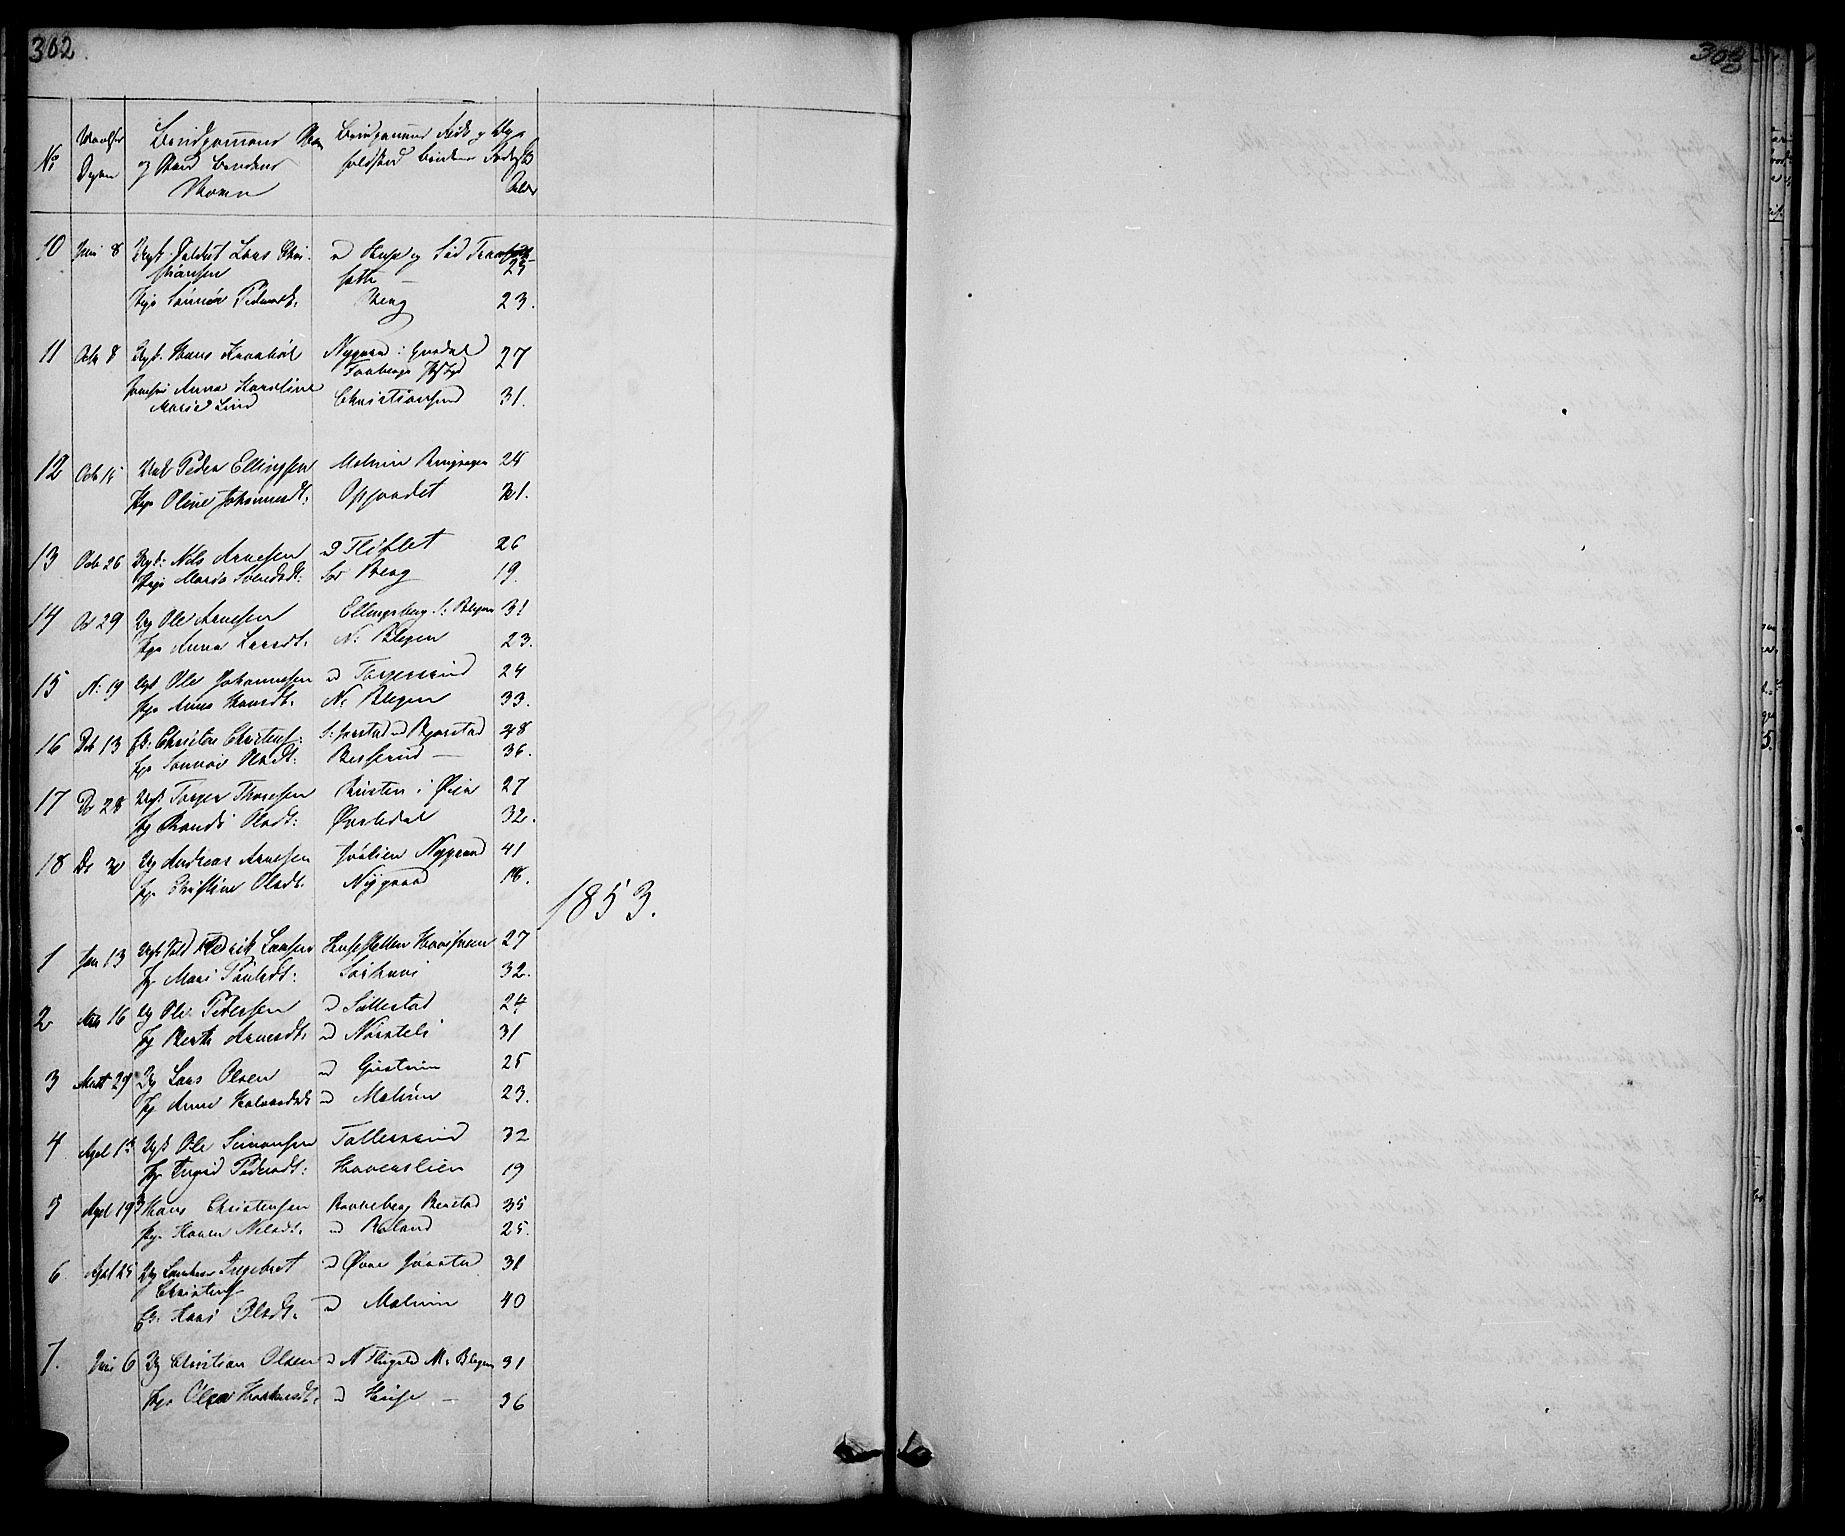 SAH, Fåberg prestekontor, Klokkerbok nr. 5, 1837-1864, s. 302-303